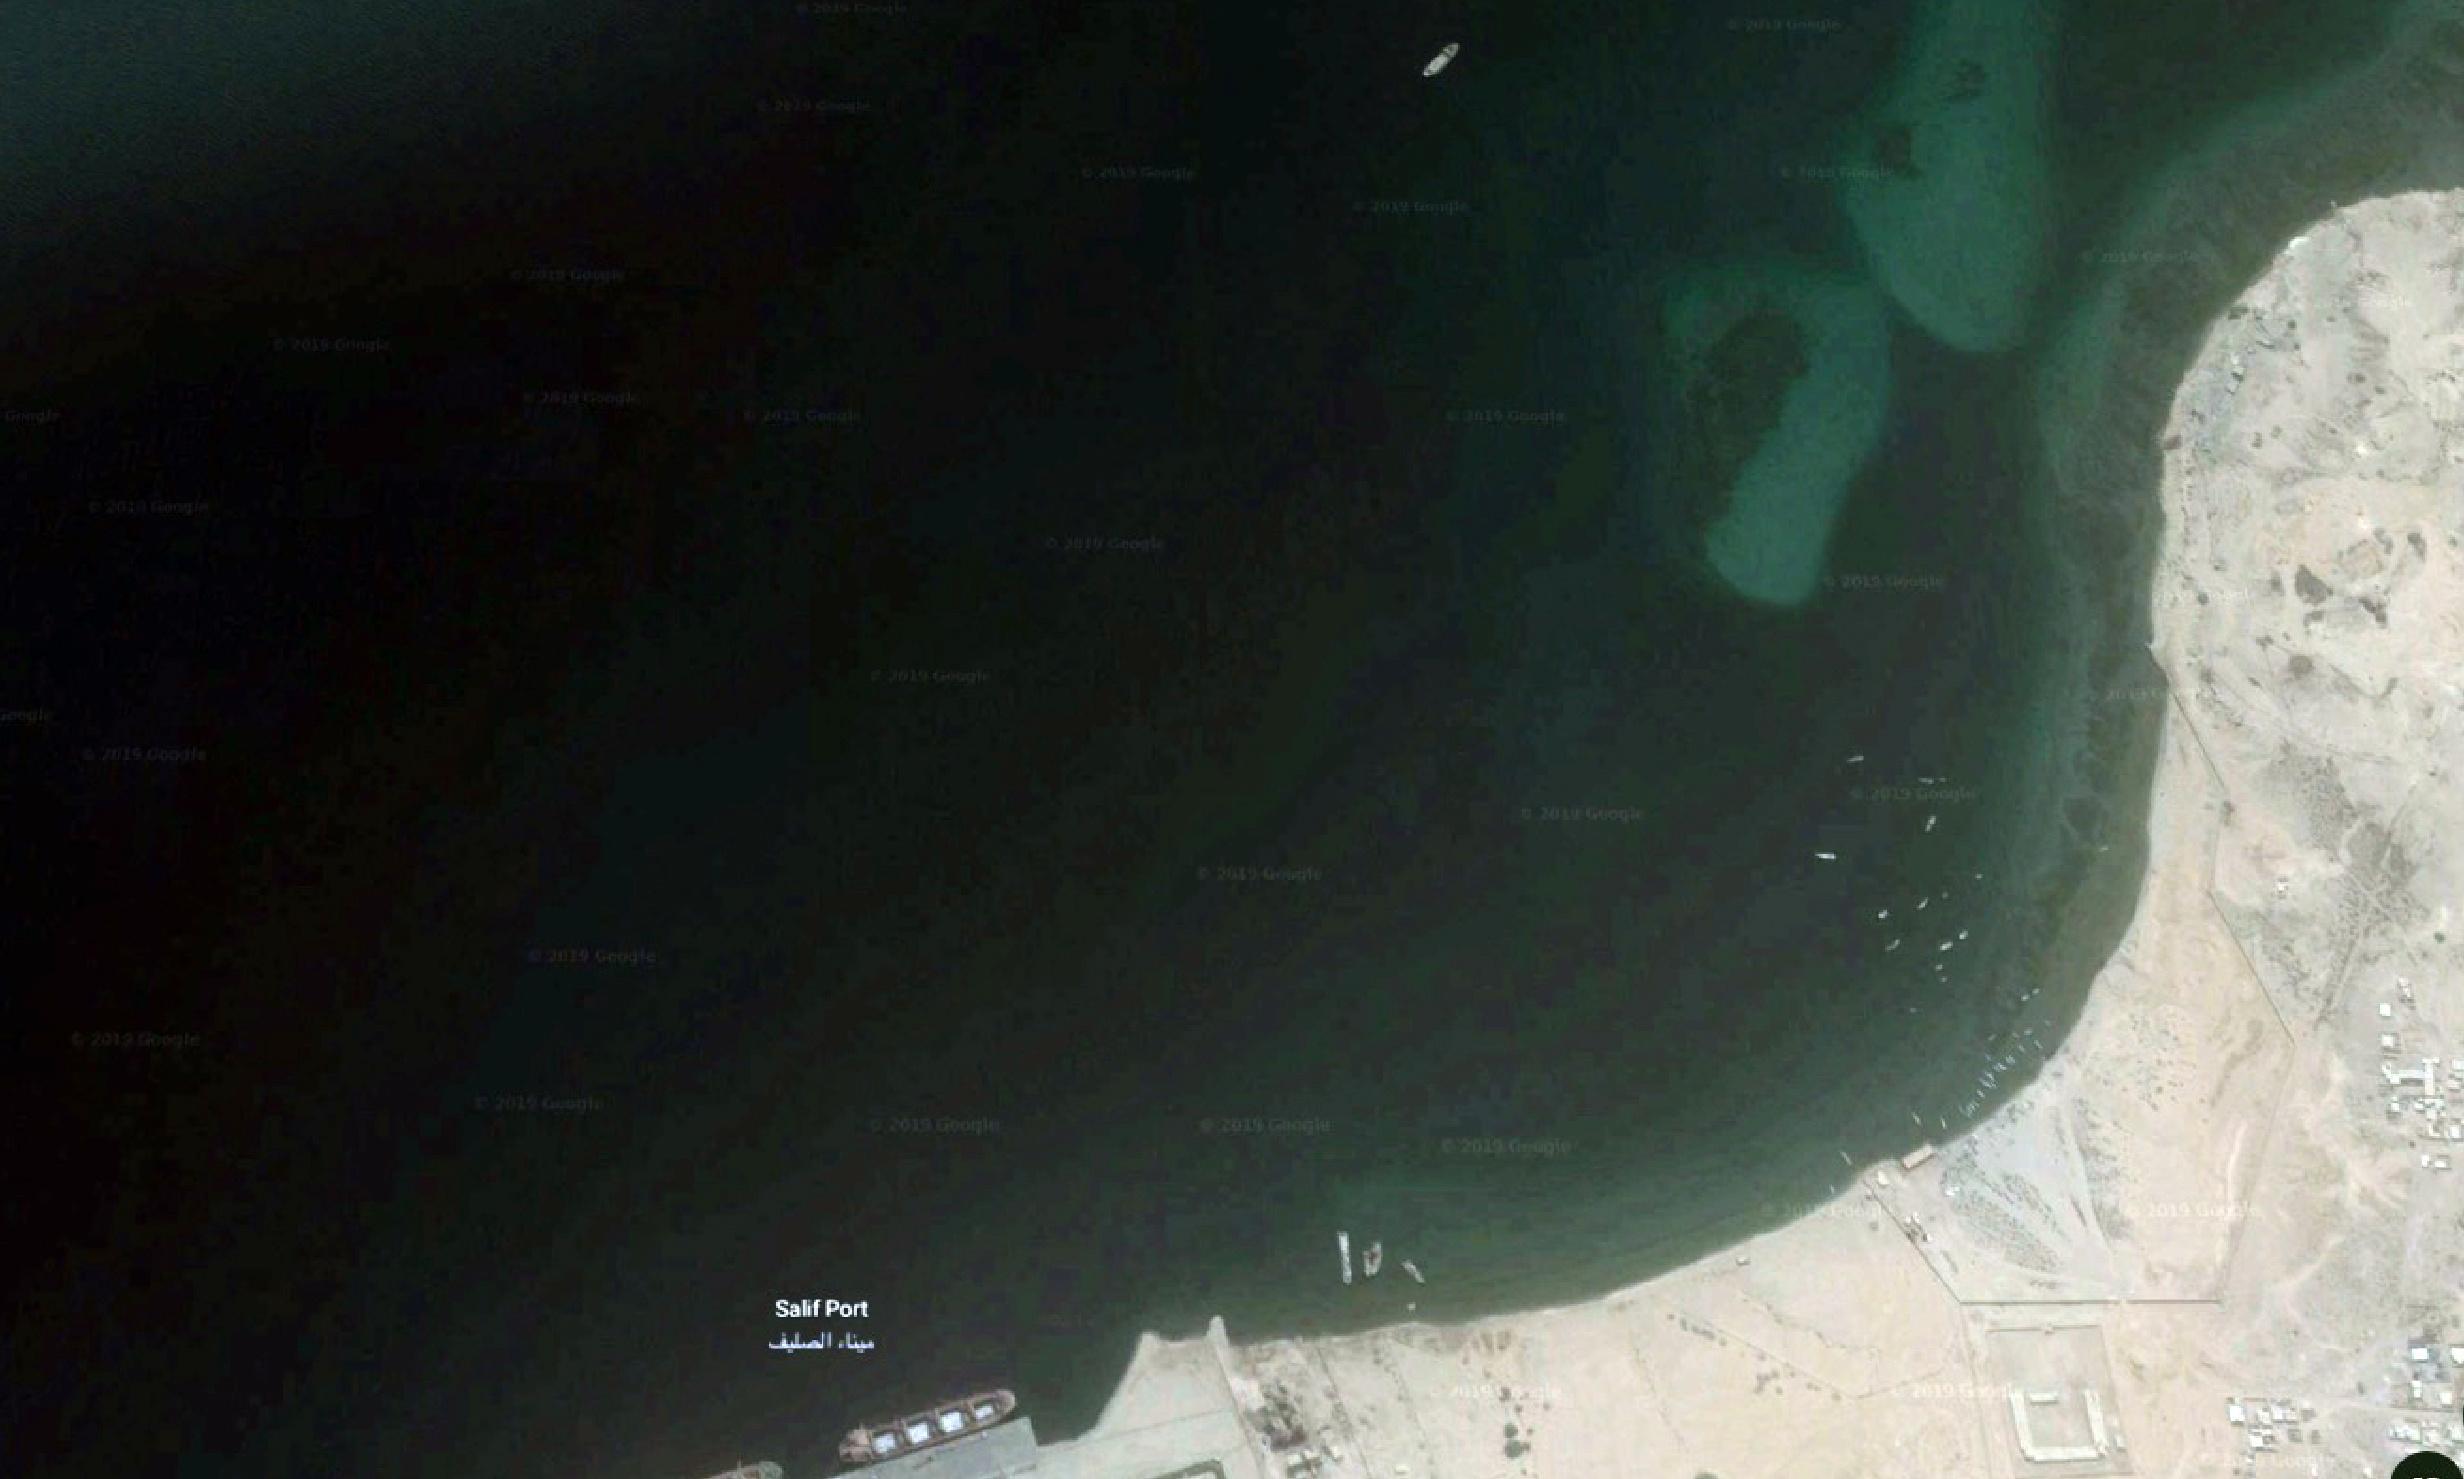 Experts fear deserted oil tanker off Yemen could explode